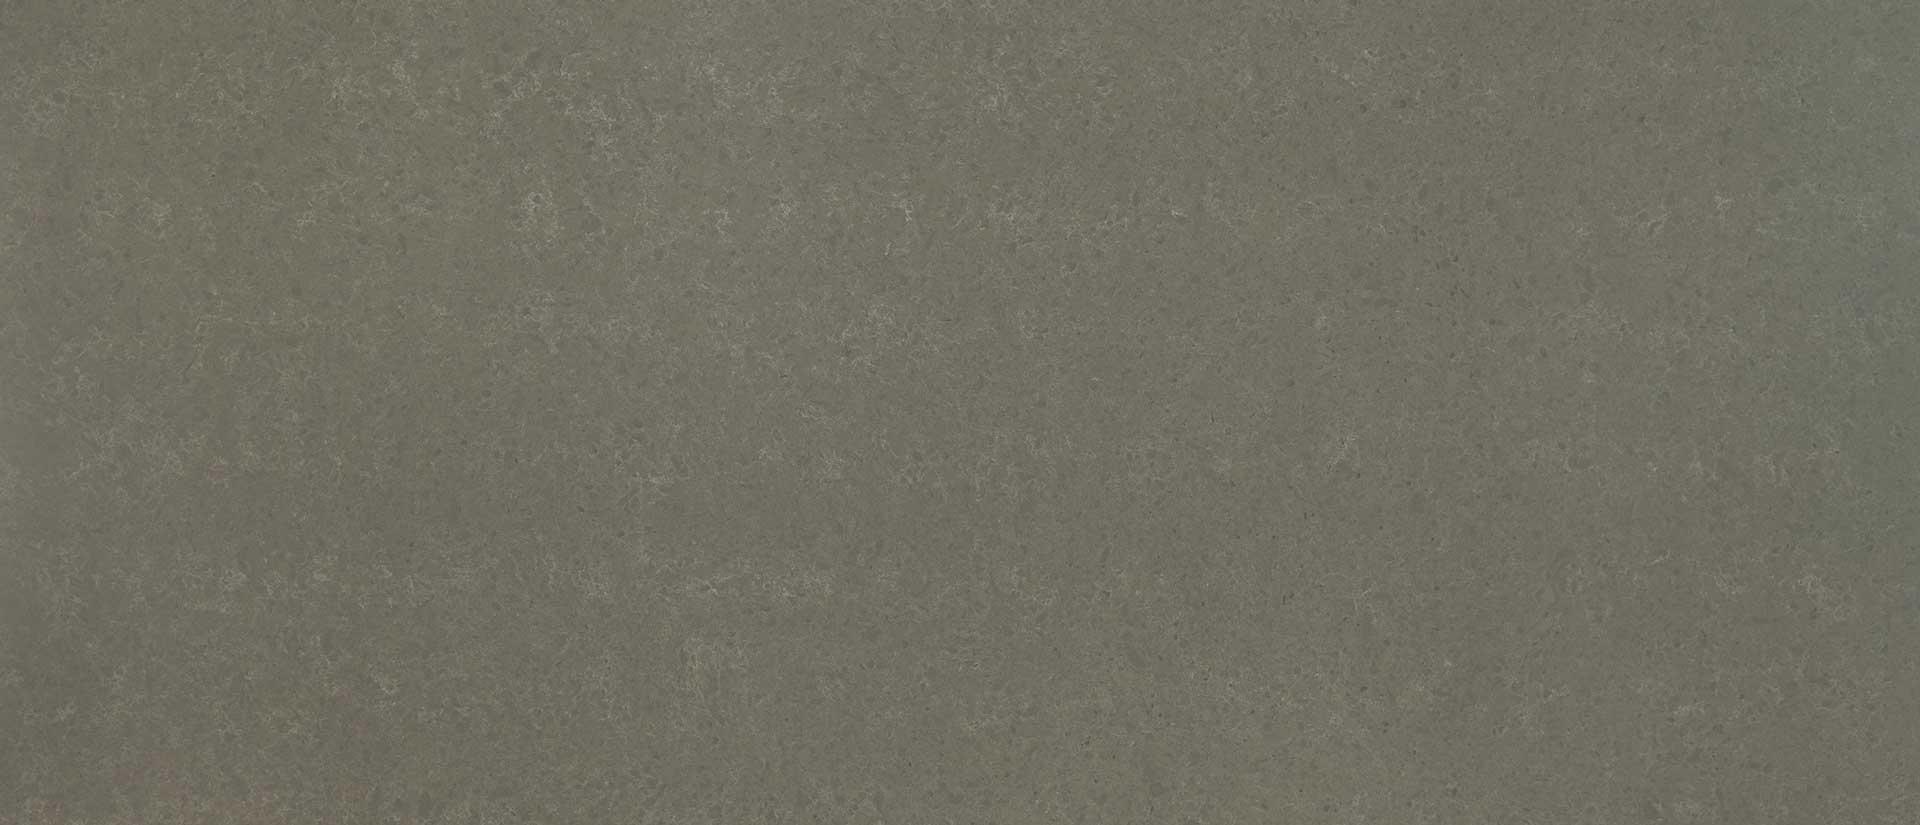 Babylon Gray Concrete Quartz